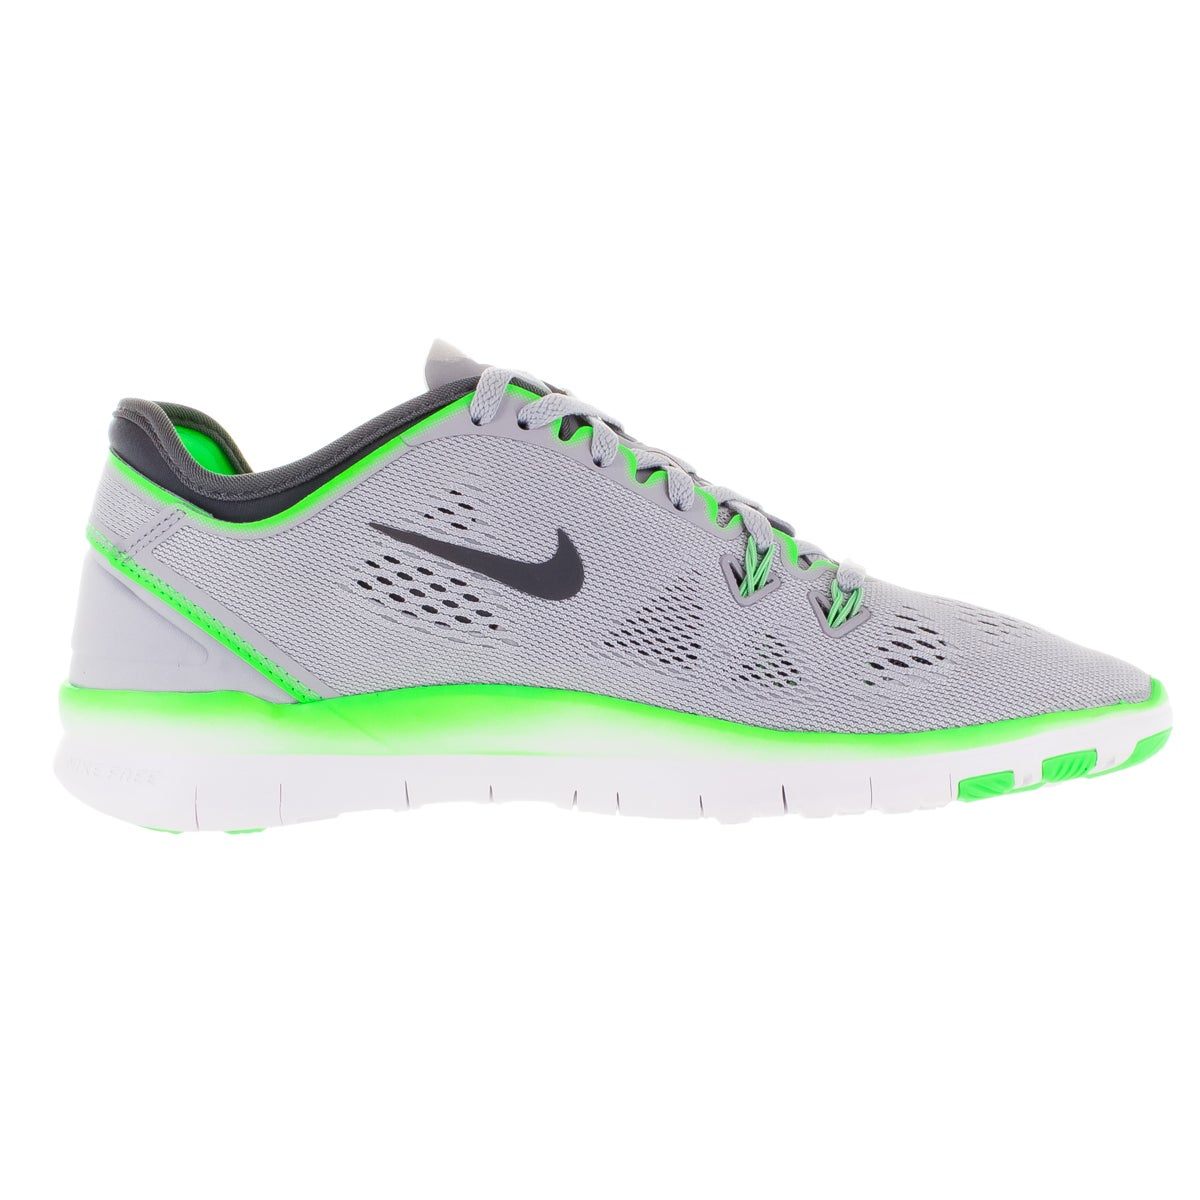 3ea2a7cf07e Shop Nike Women s Free 5.0 Tr Fit 5 Wolf Grey Dark Grey  Green Training  Shoe - Free Shipping Today - Overstock - 12322002